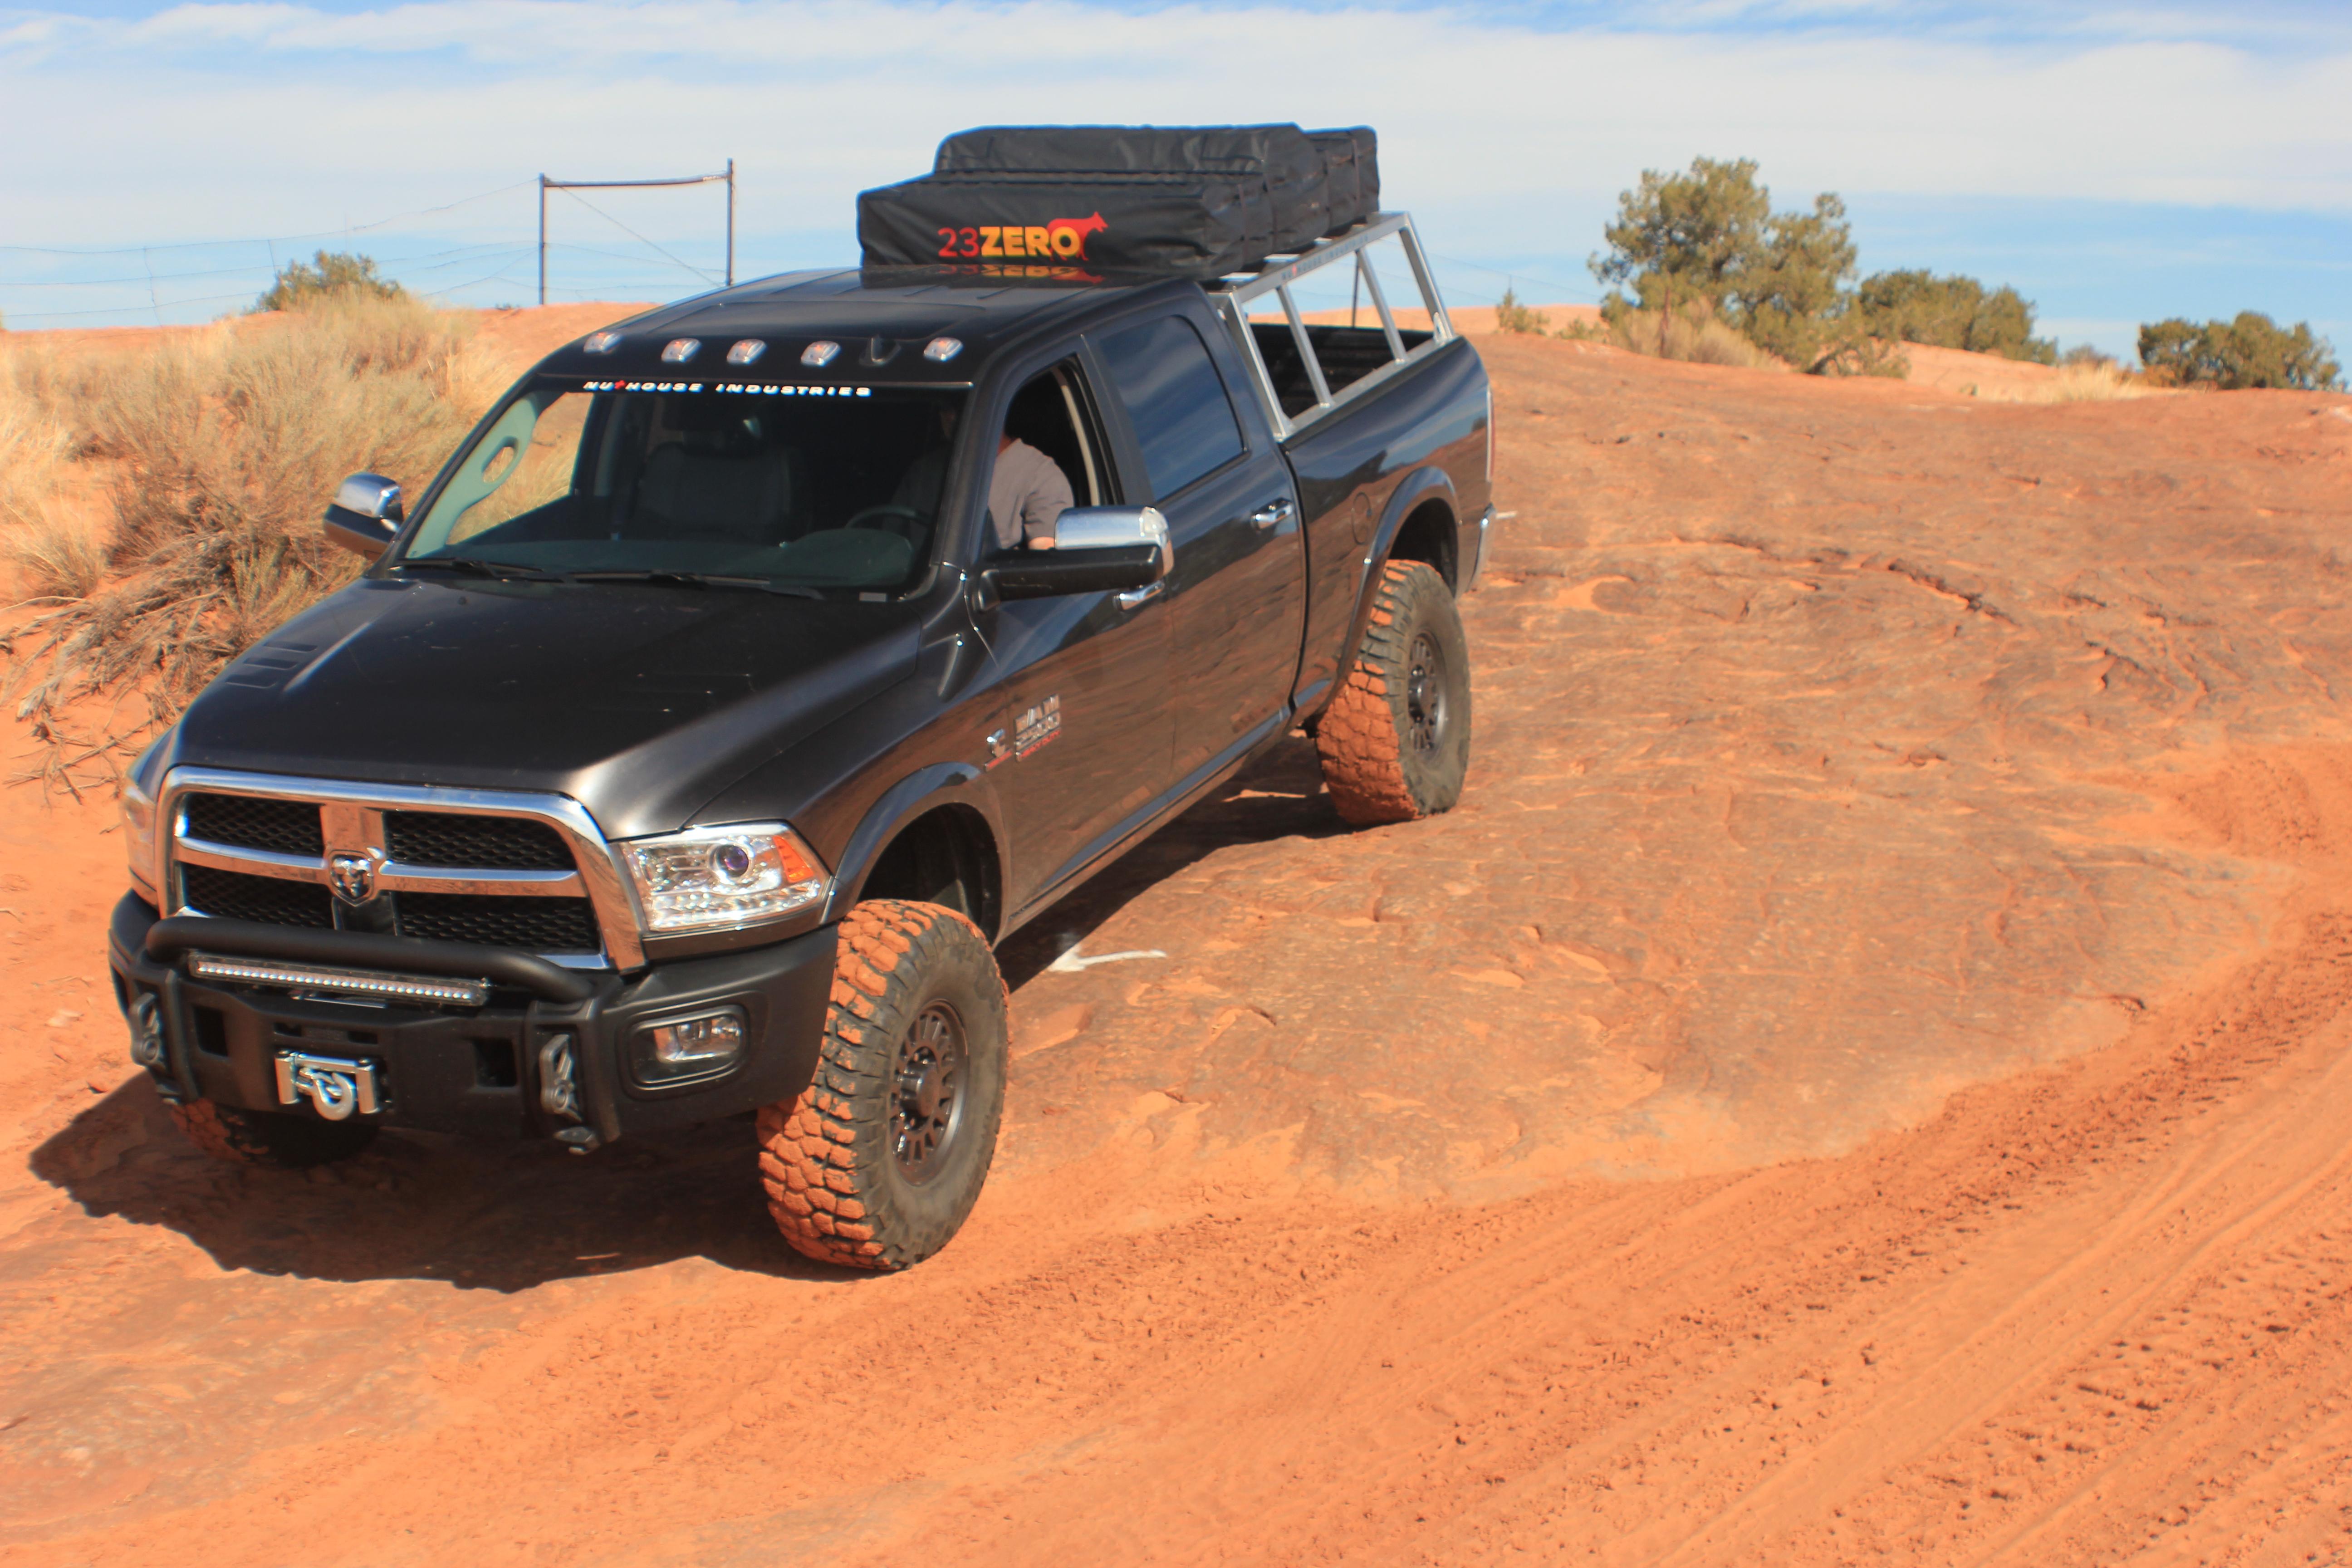 aa62f1b757 Dodge Ram Expedition Truck, Overlanding Truck, Truck Rack, Moab Utah  offroad, Aluminum